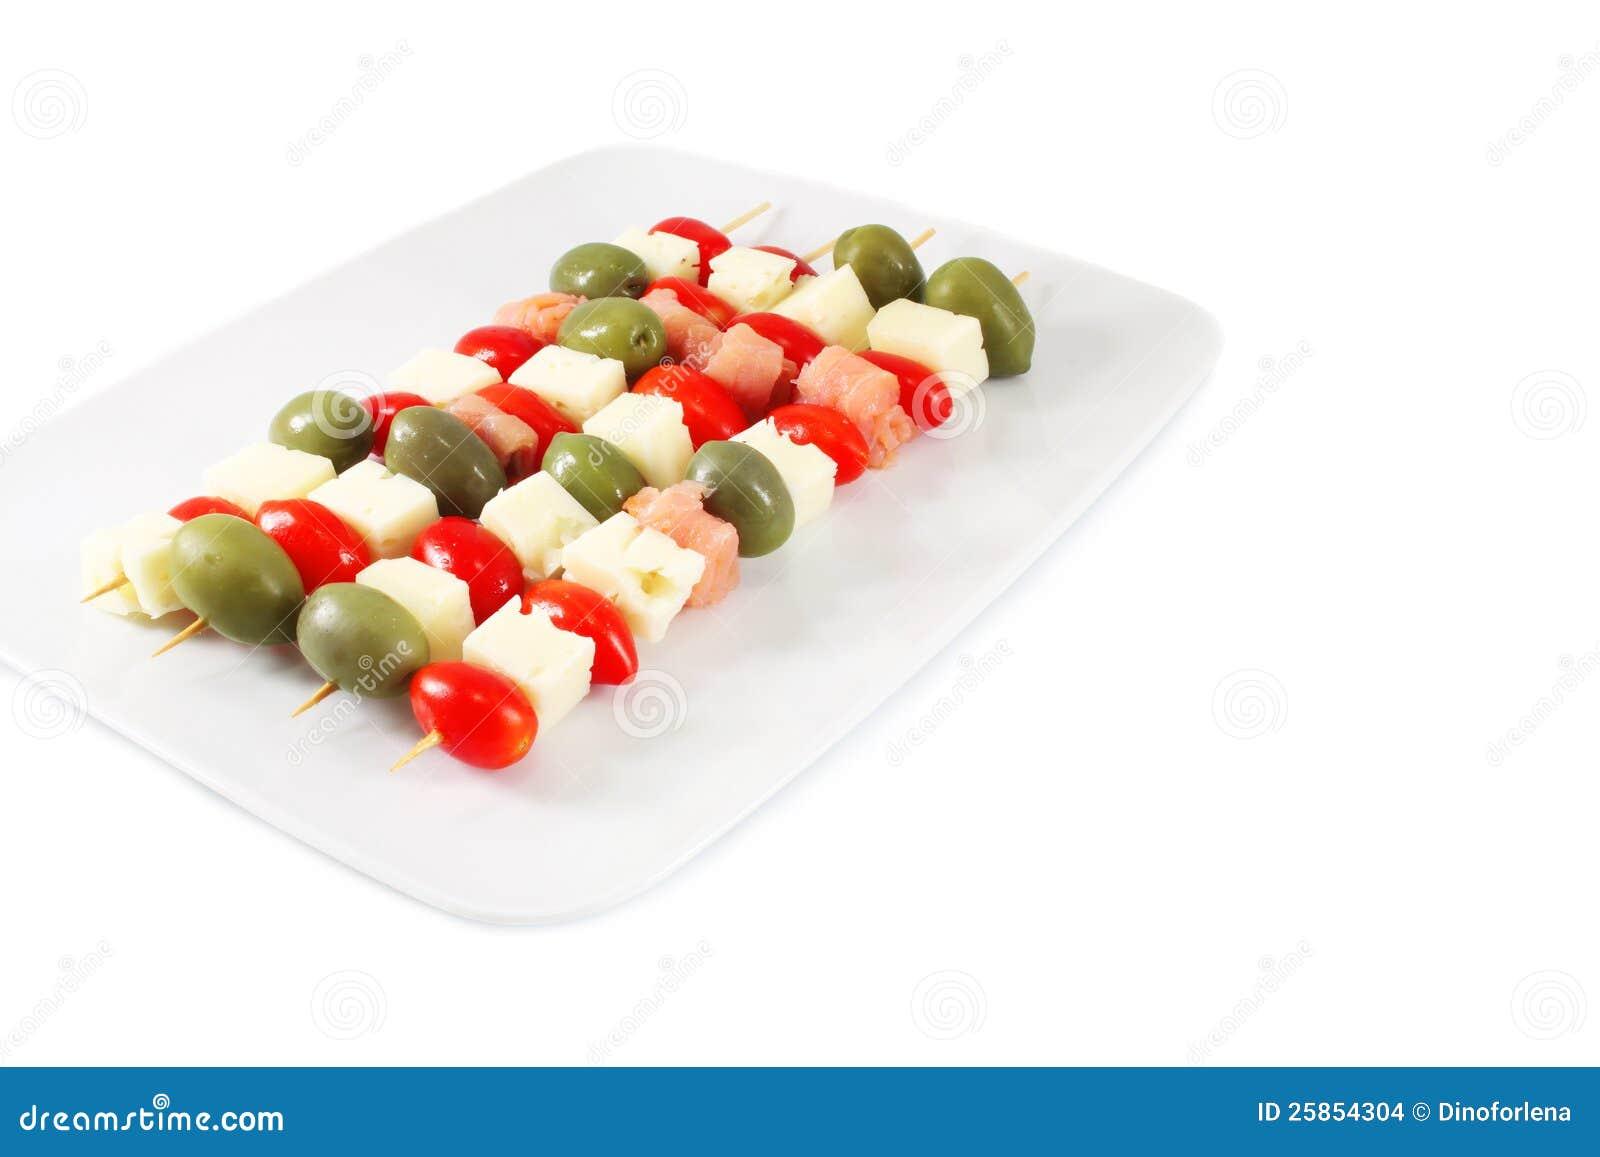 Appetizer on skewers